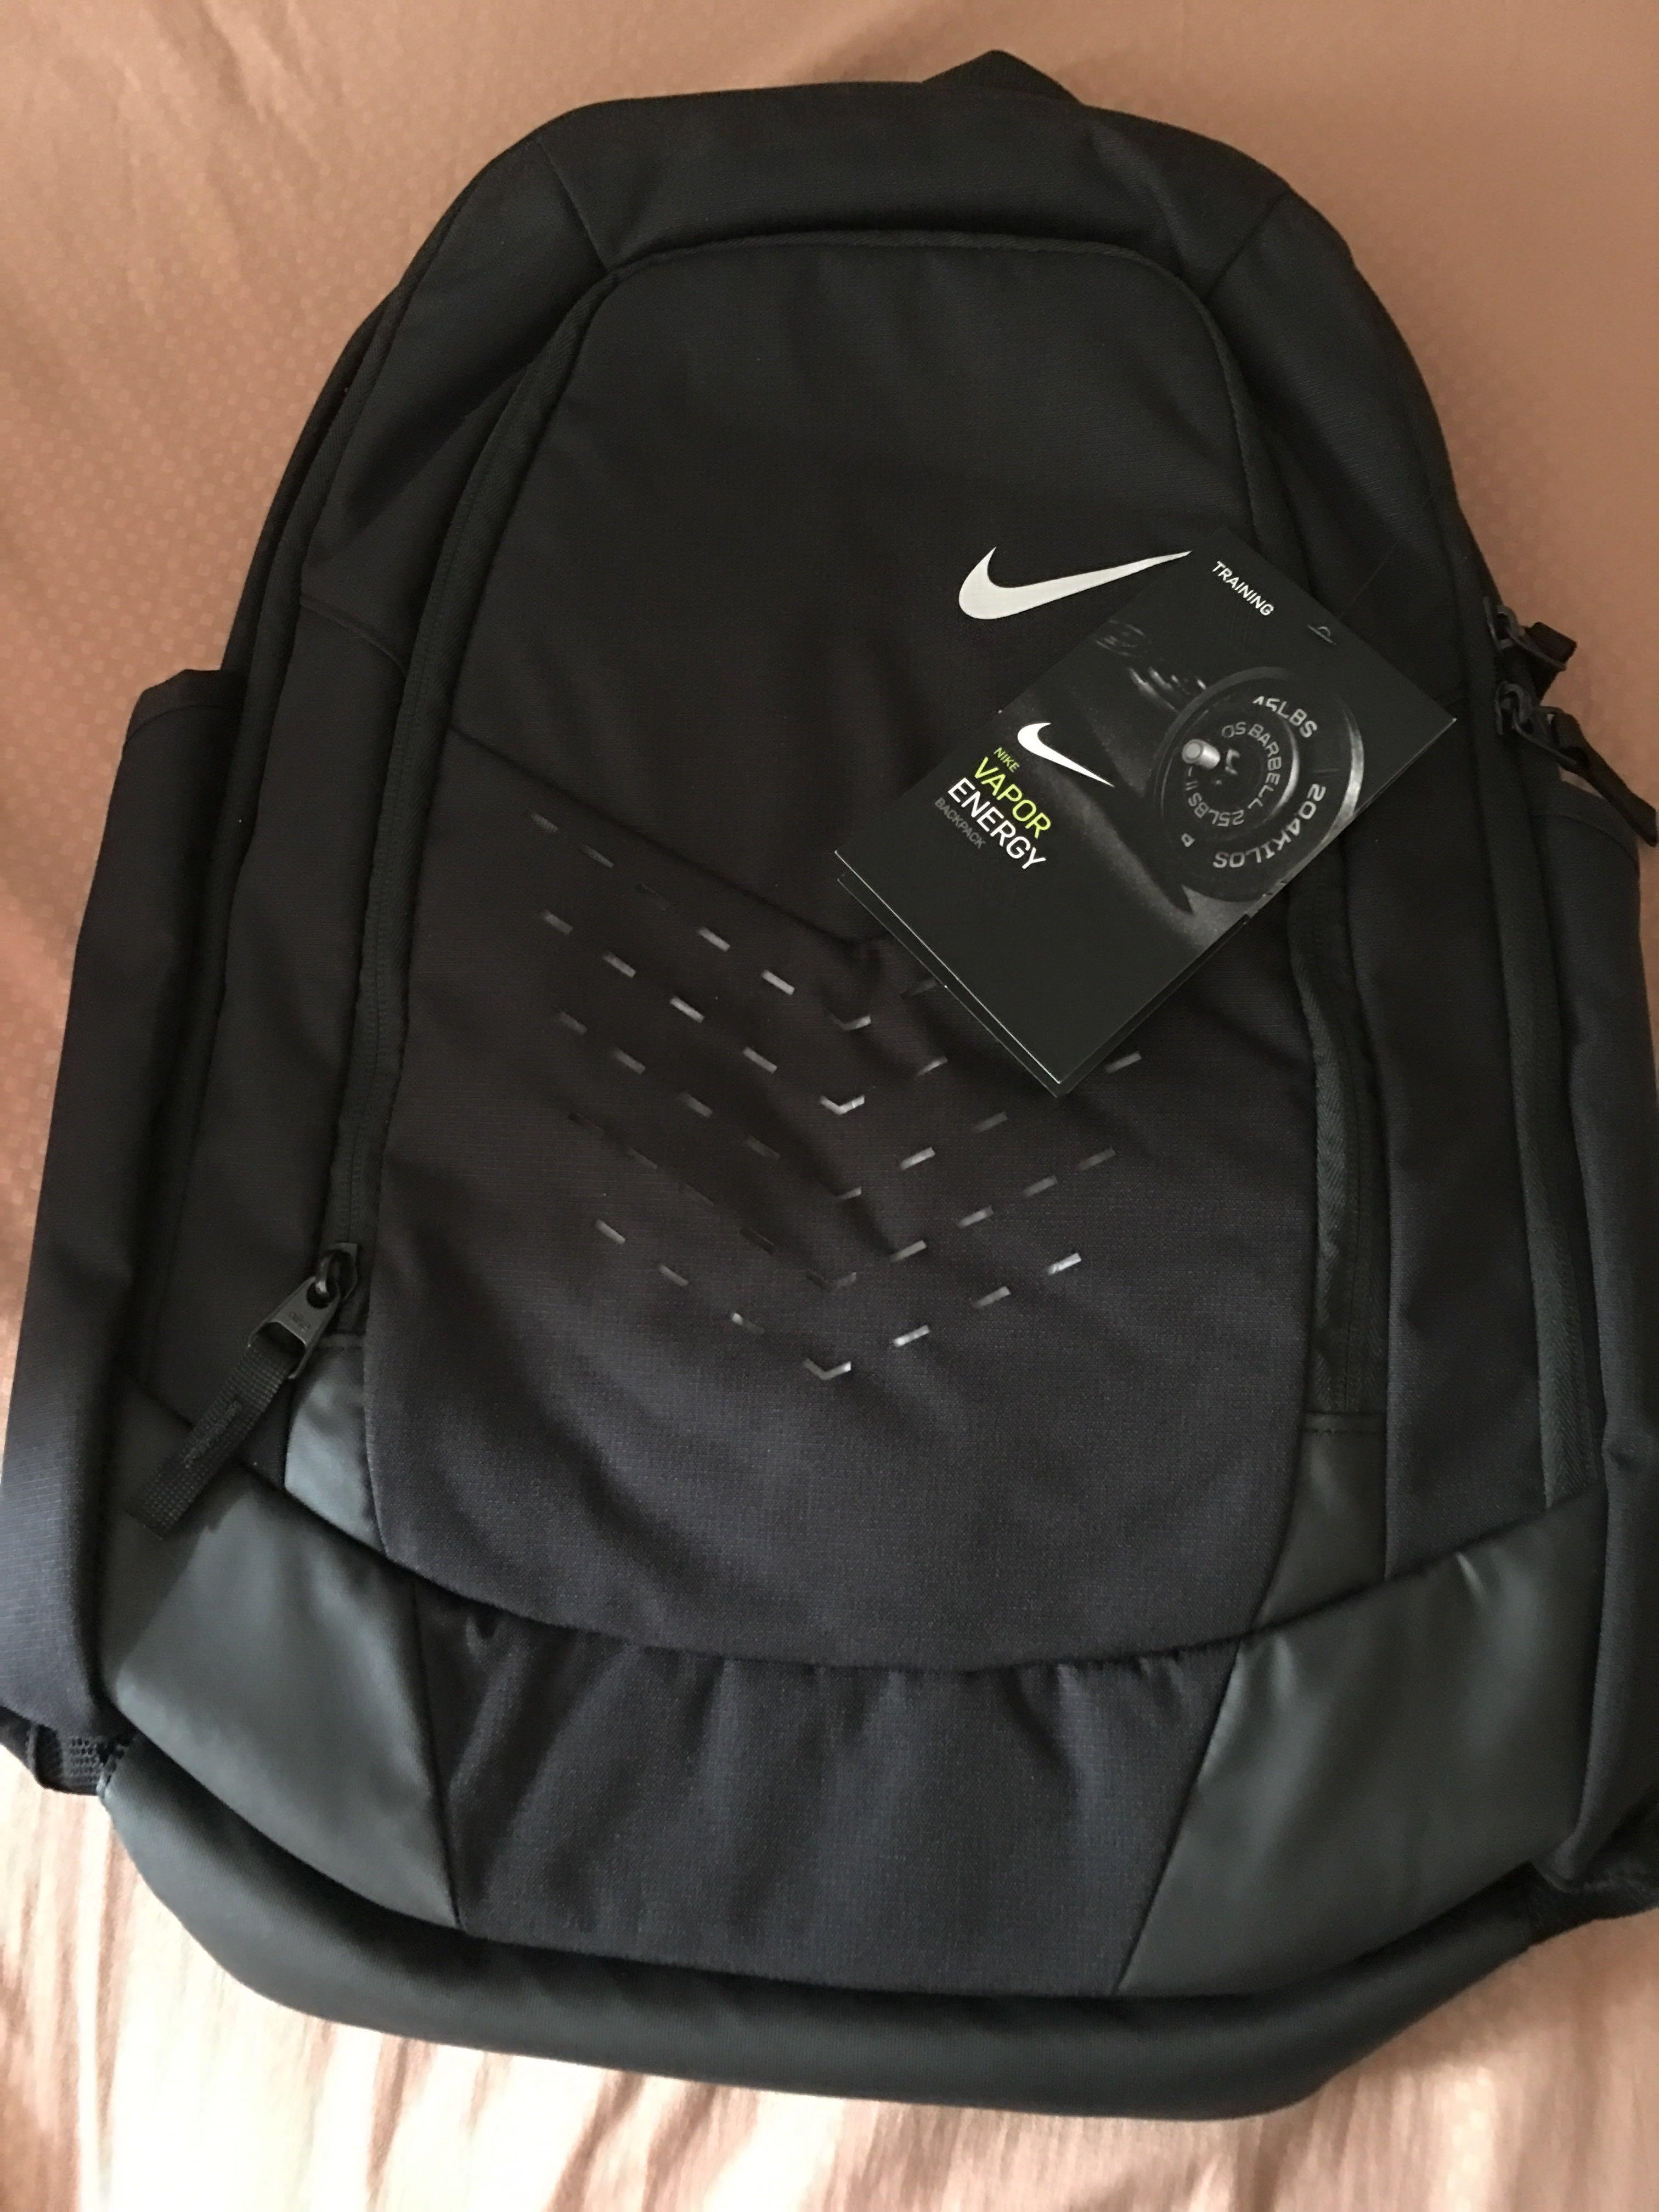 Authentic Nike Vapor Energy Backpack, Men's Fashion, Bags